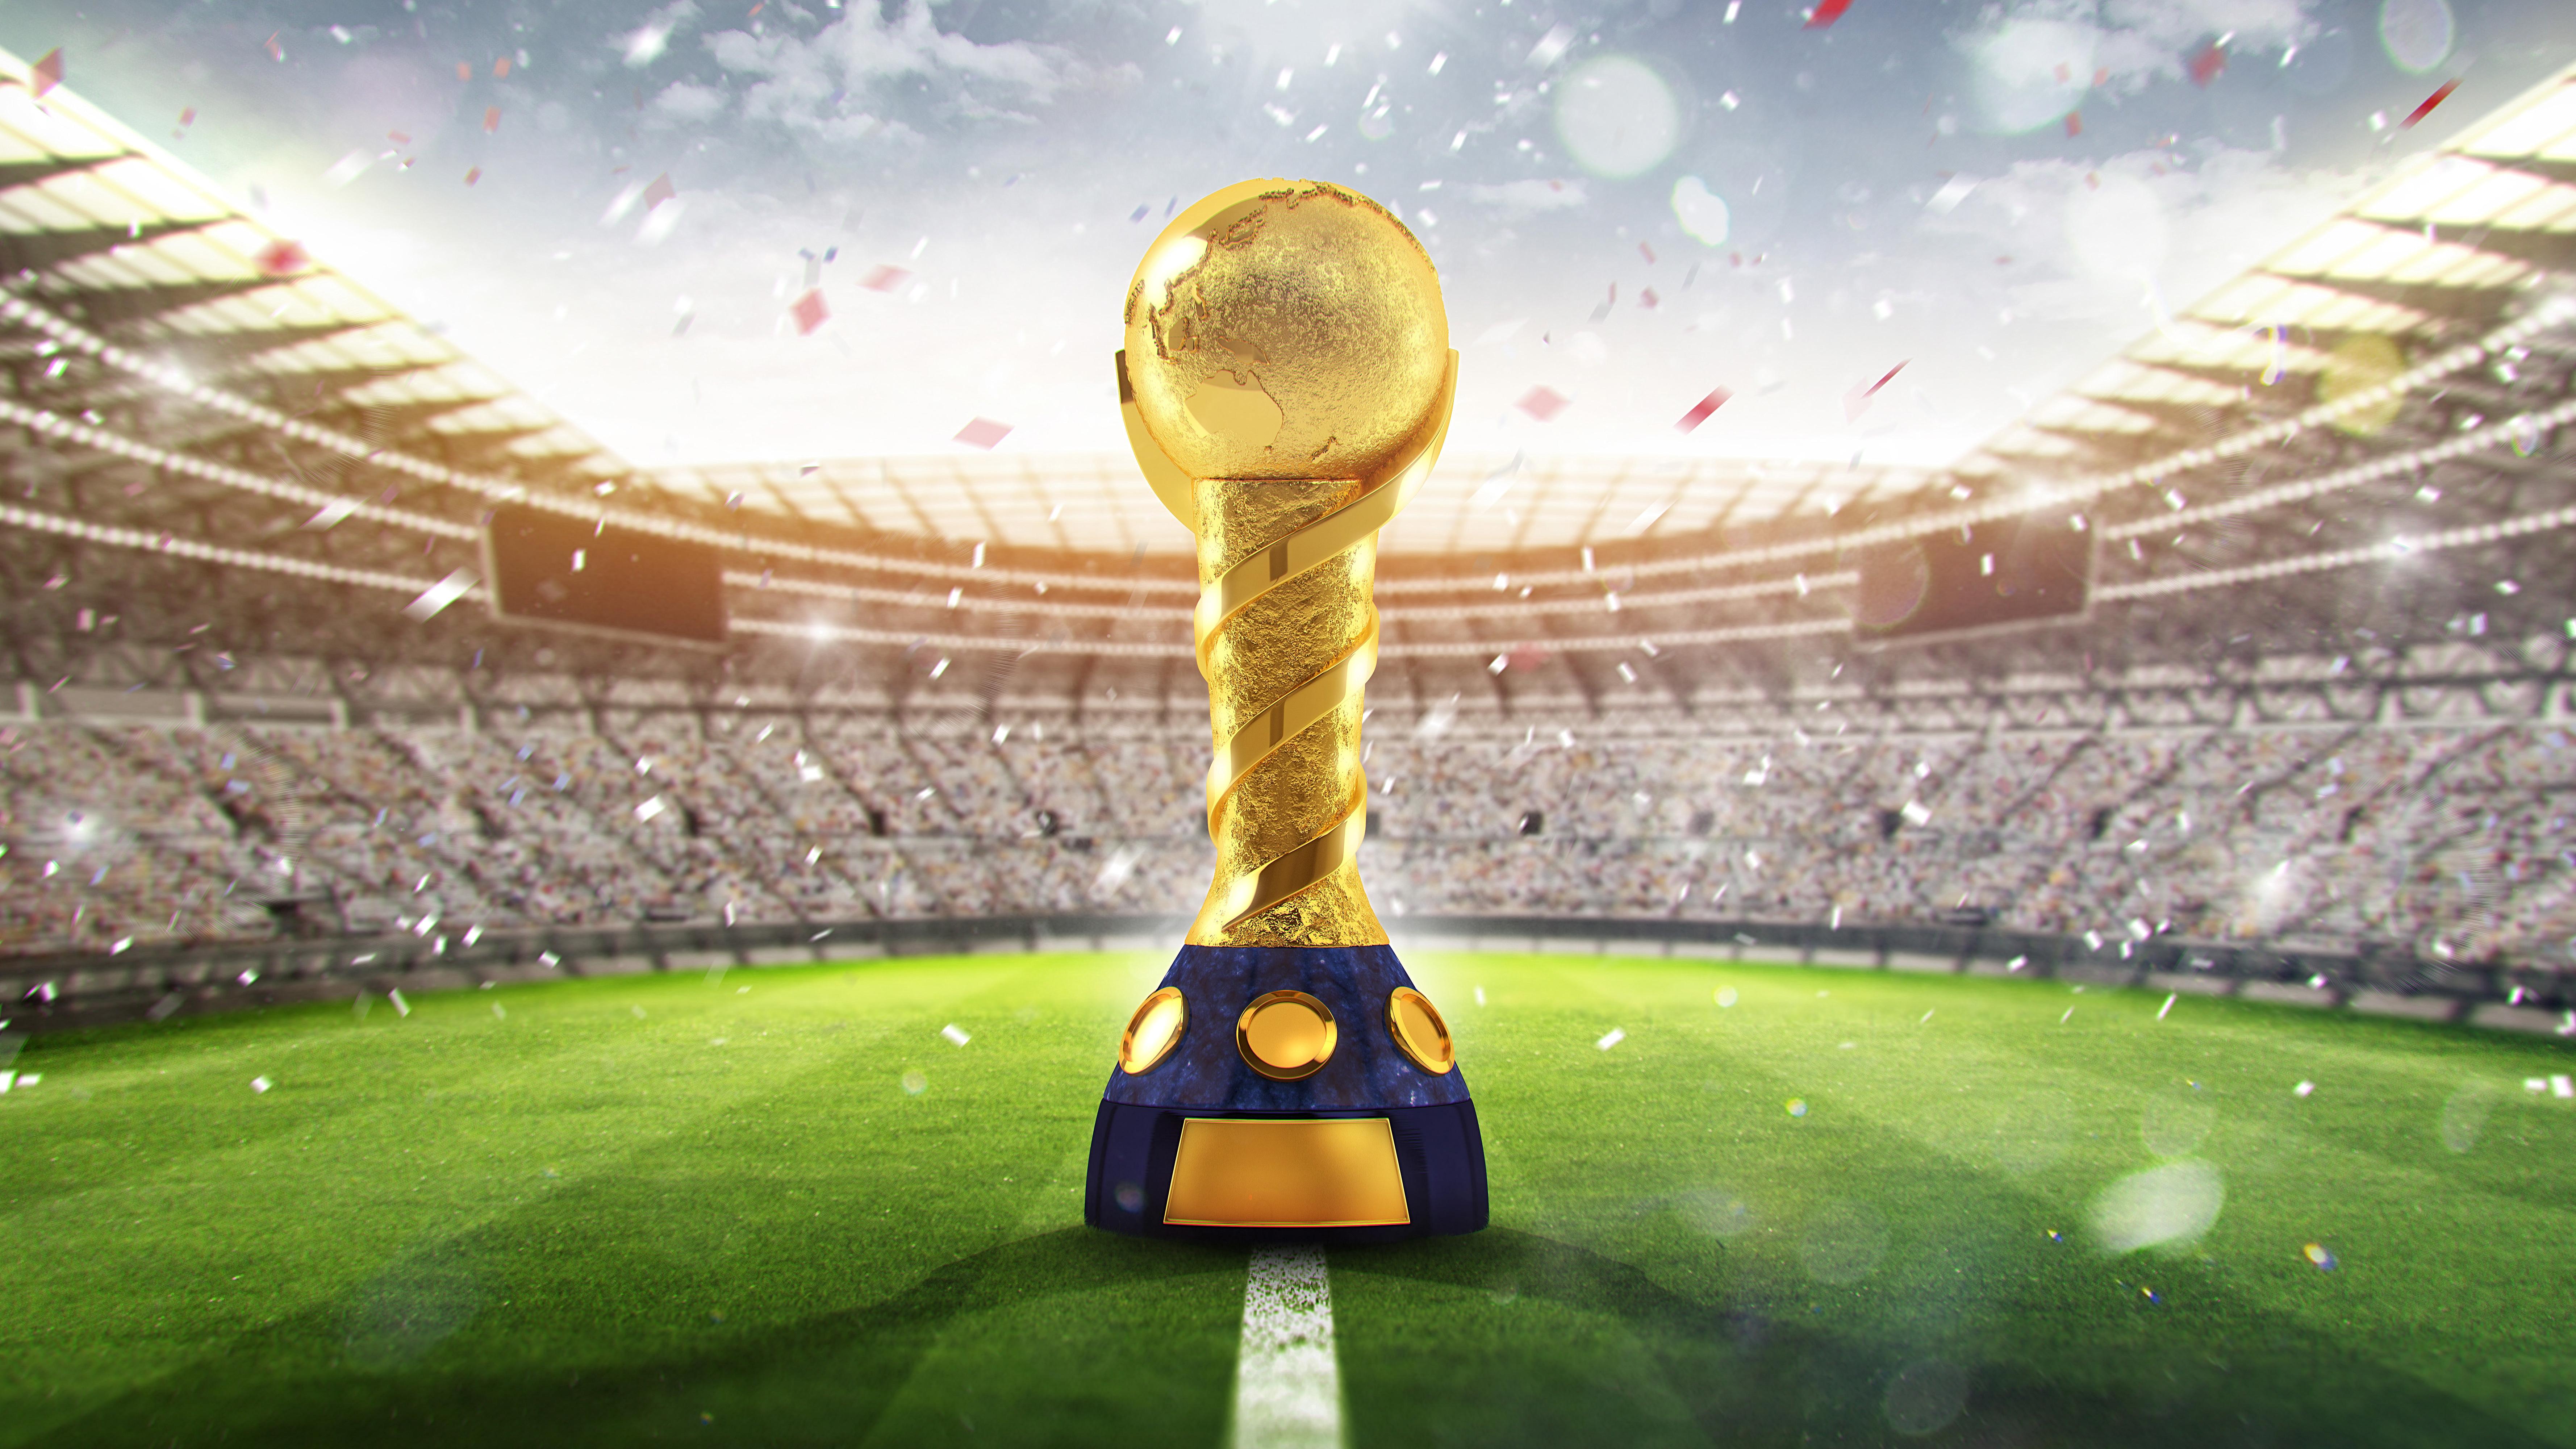 1366x768 fifa world cup russia 2018 trophy 1366x768 - Nature ka wallpaper ...